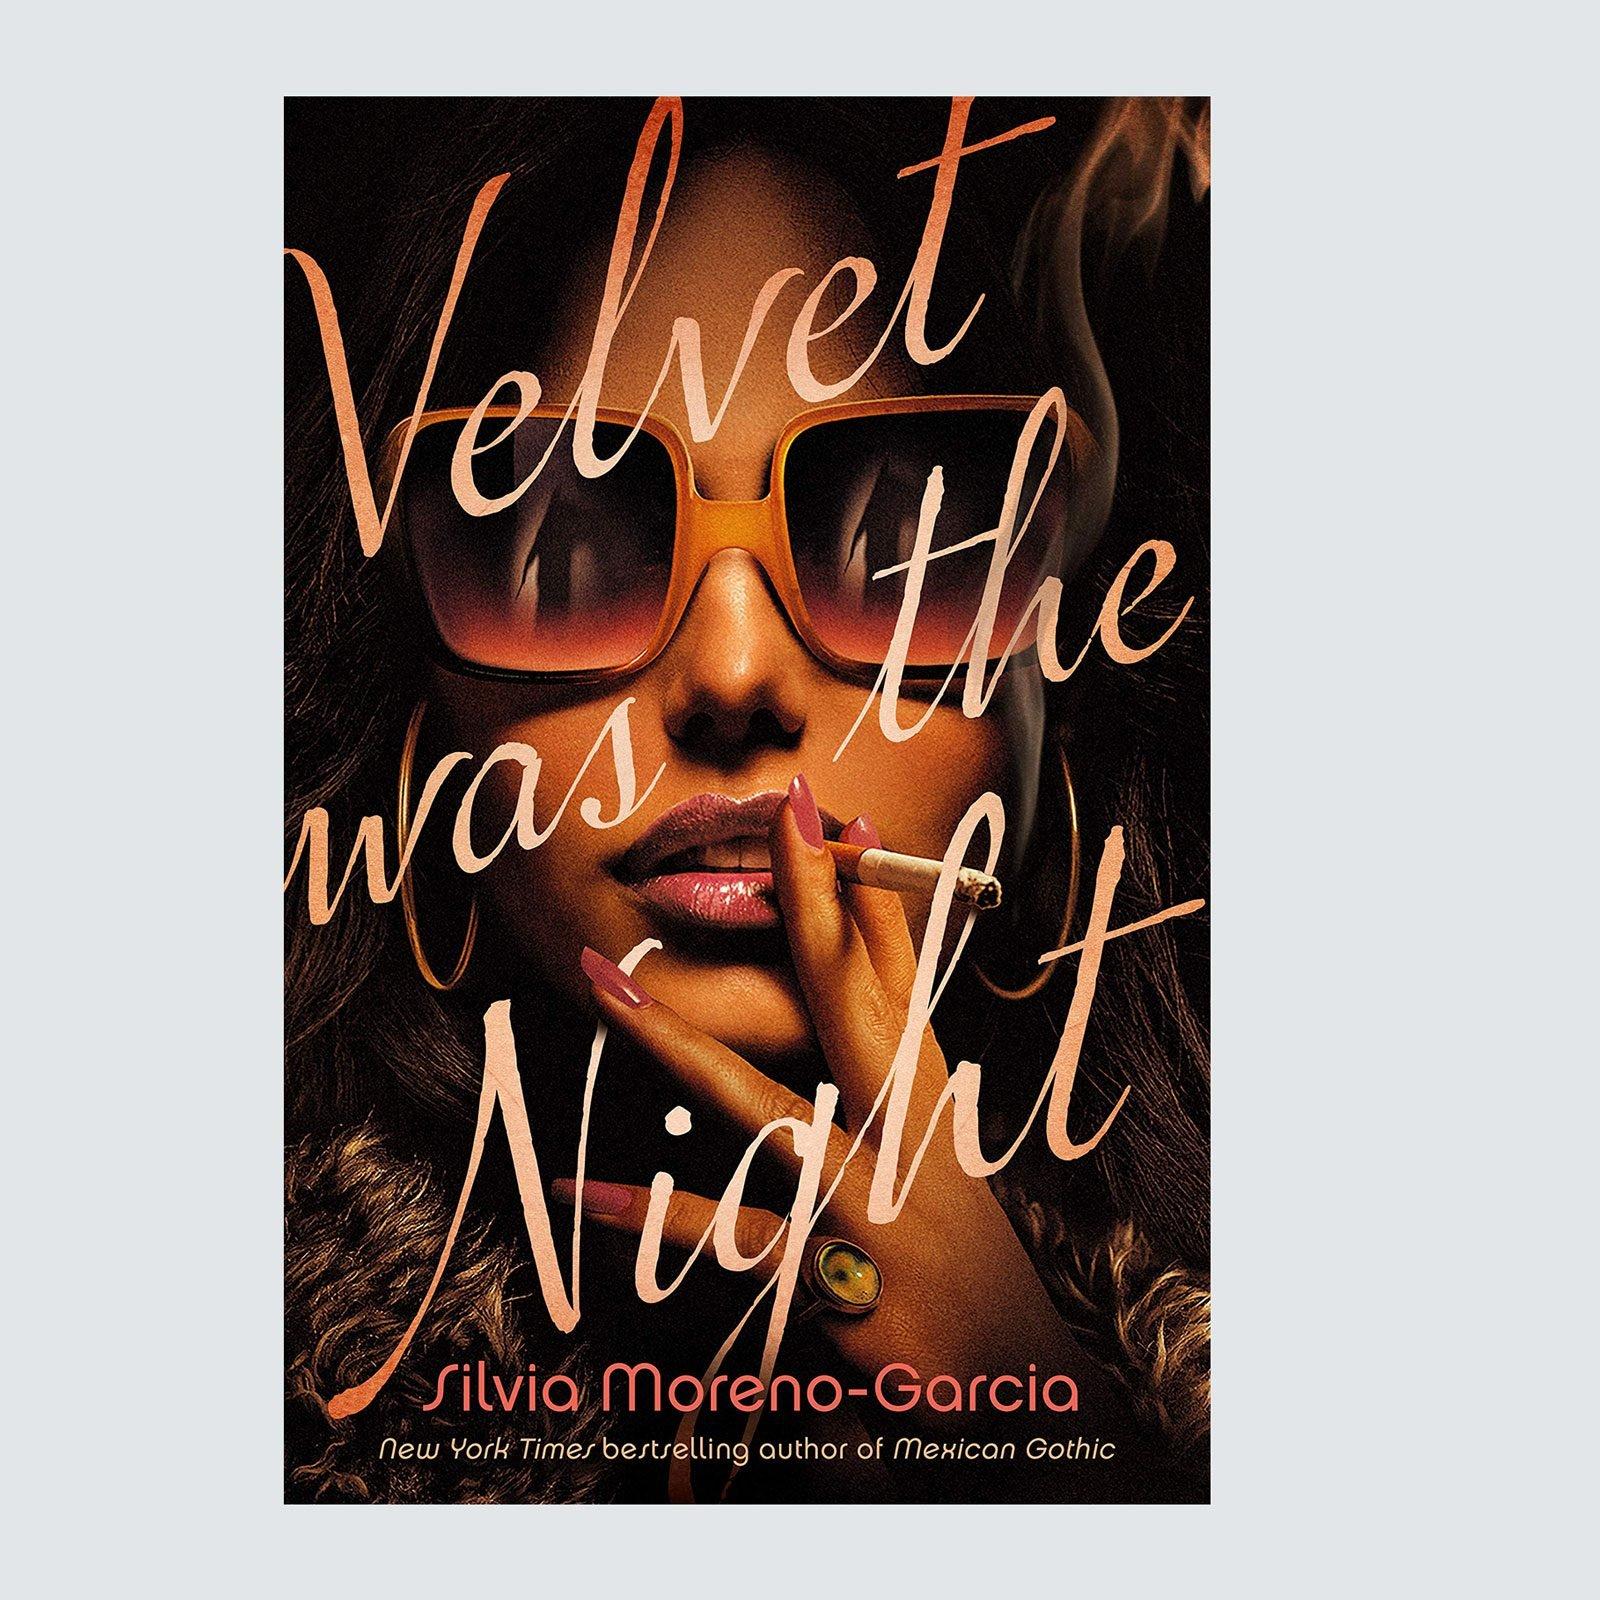 Velvet Was the Night by Silvia Moreno-Garcia